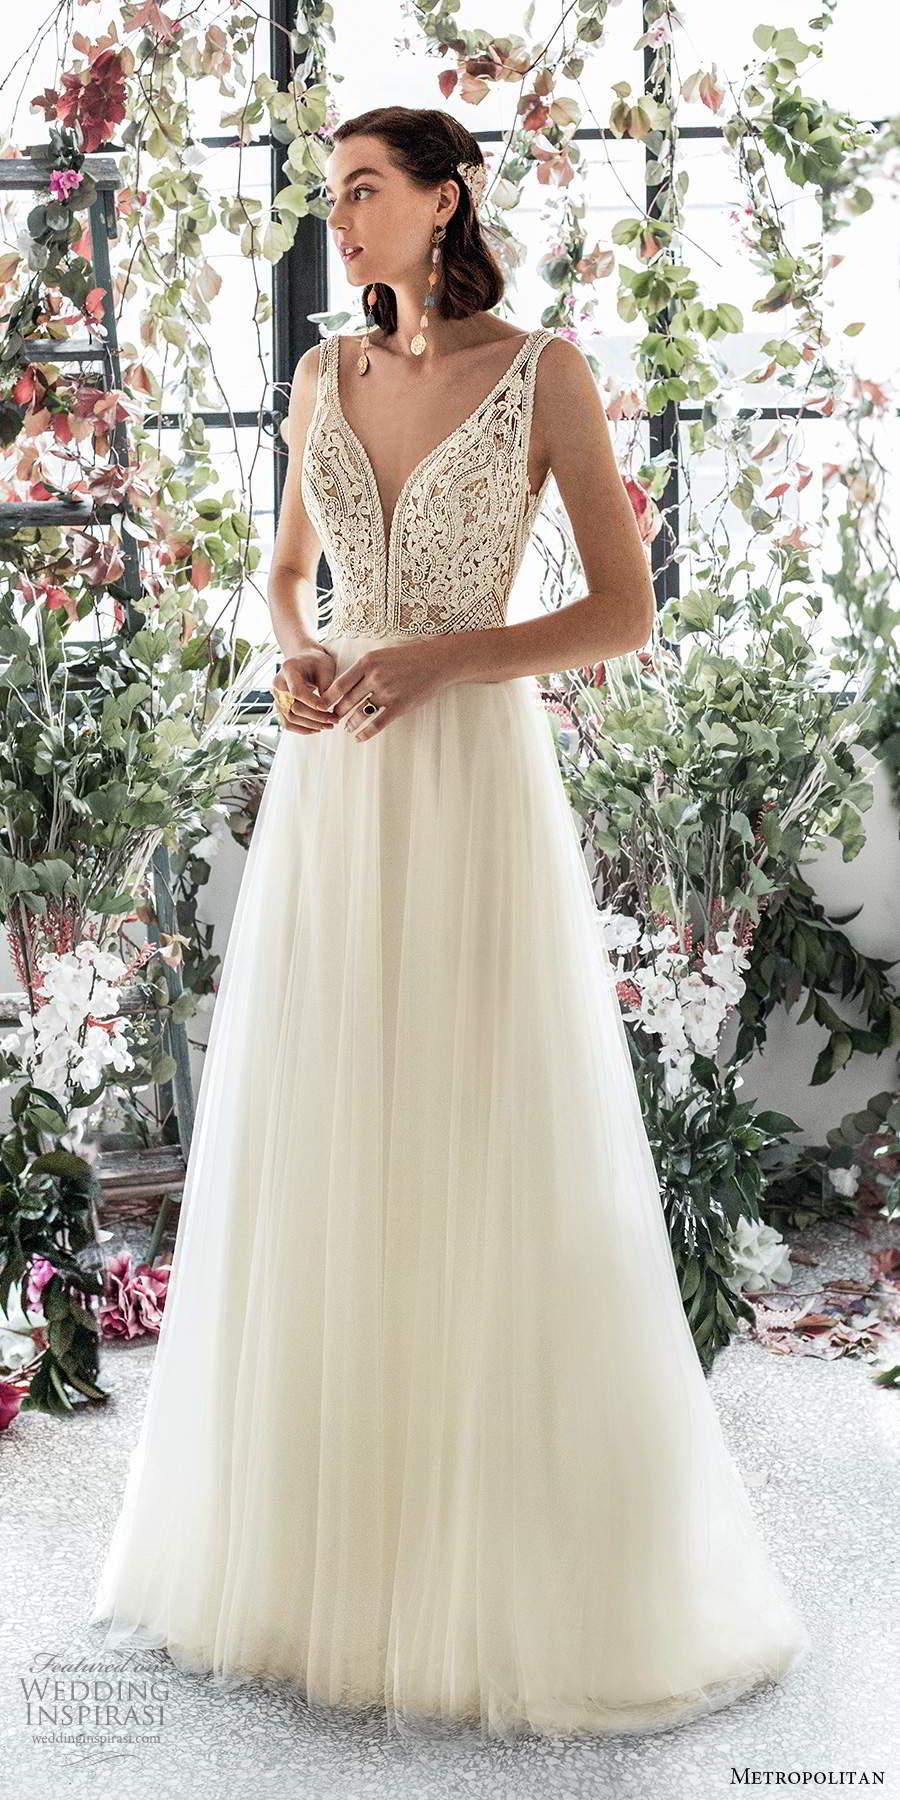 metropolitan spring 2020 bridal sleeveless thick straps plunging v neckline embellished lace bodice soft a line wedding dress low back chapel train (12) mv